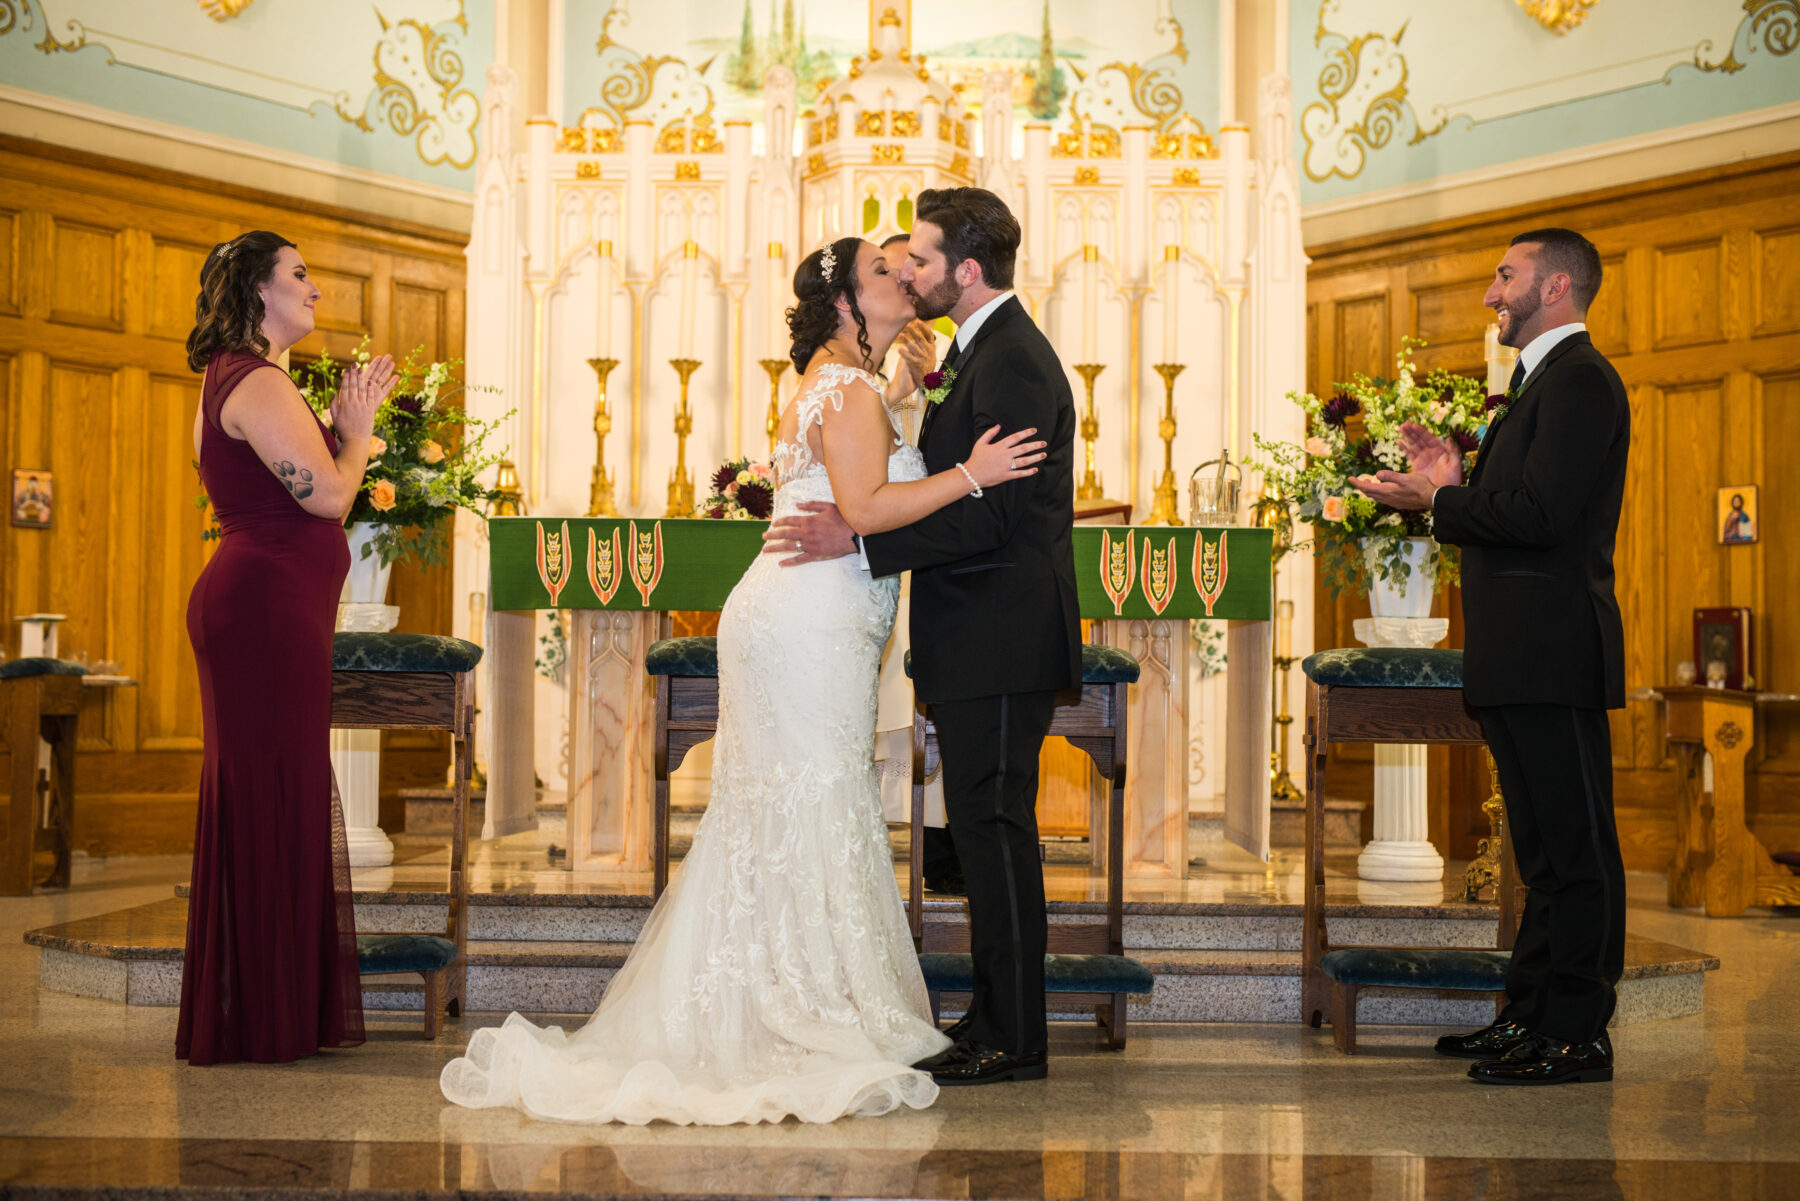 Rhodes on the Pawtuxet Cranston Wedding Carolyn and Tony Blueflash Photography 9